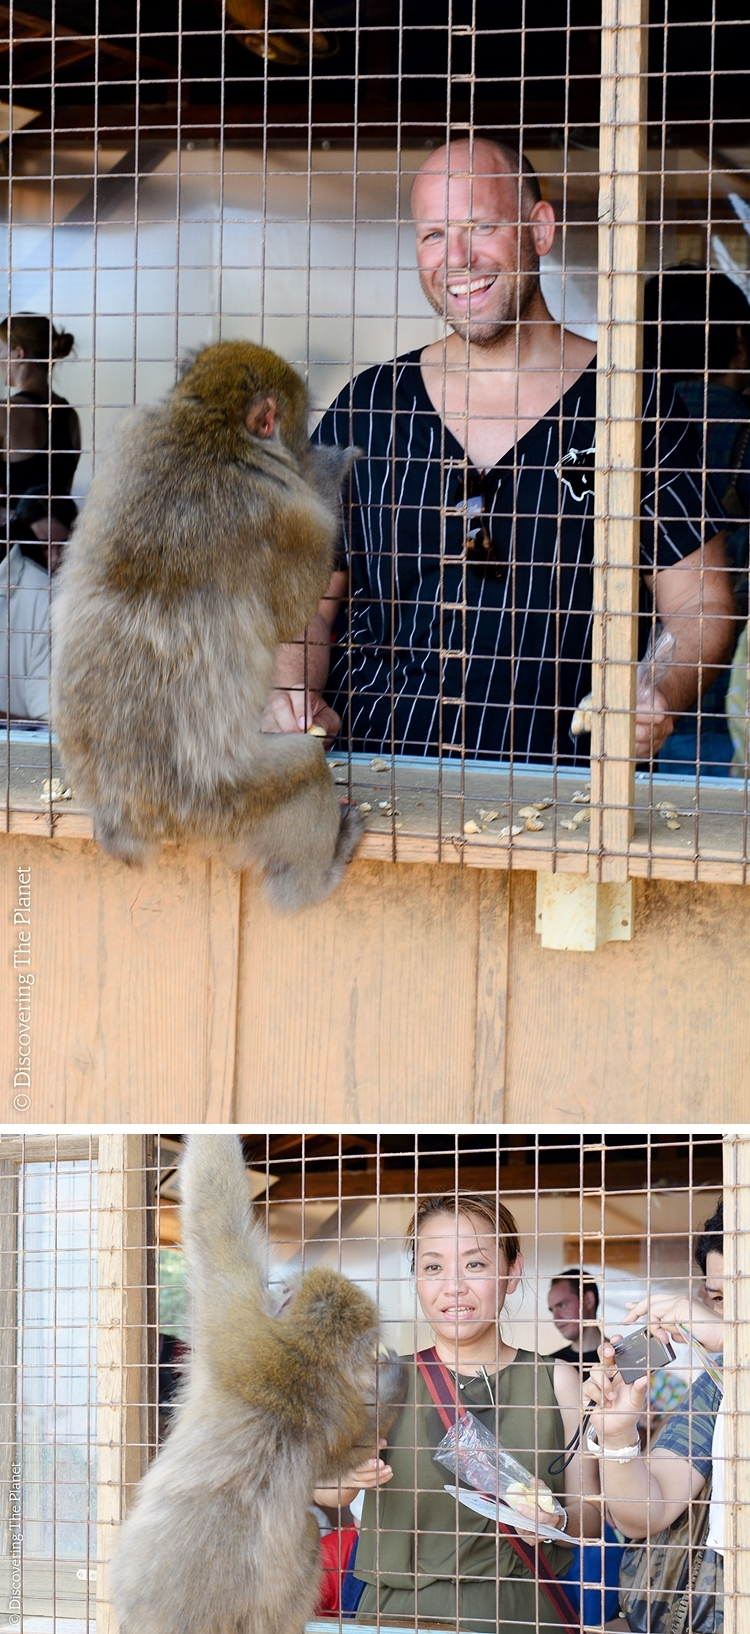 Japan, Arashyima Monkey 3